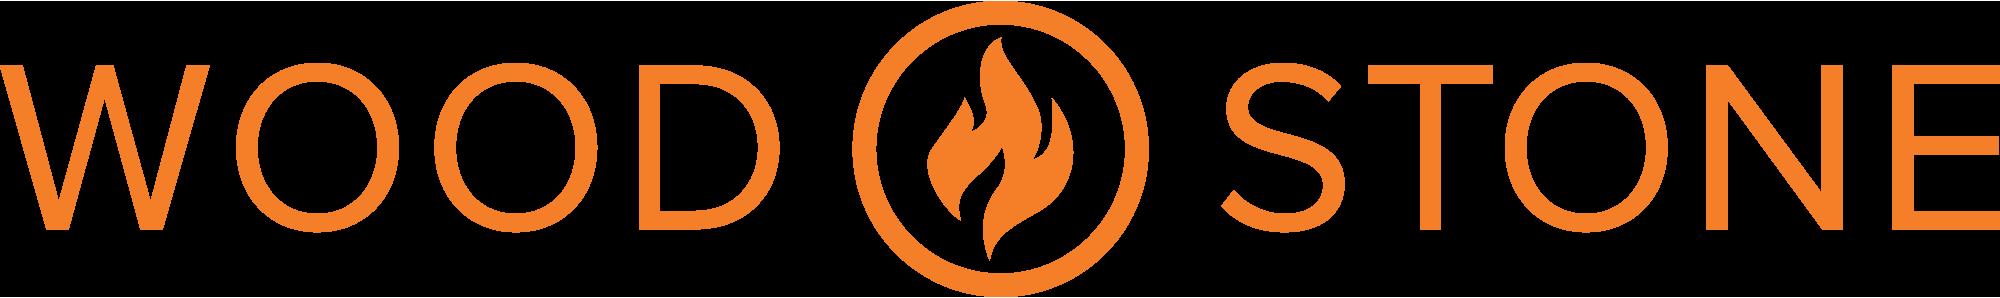 WS_Logo_Horiz_Orange